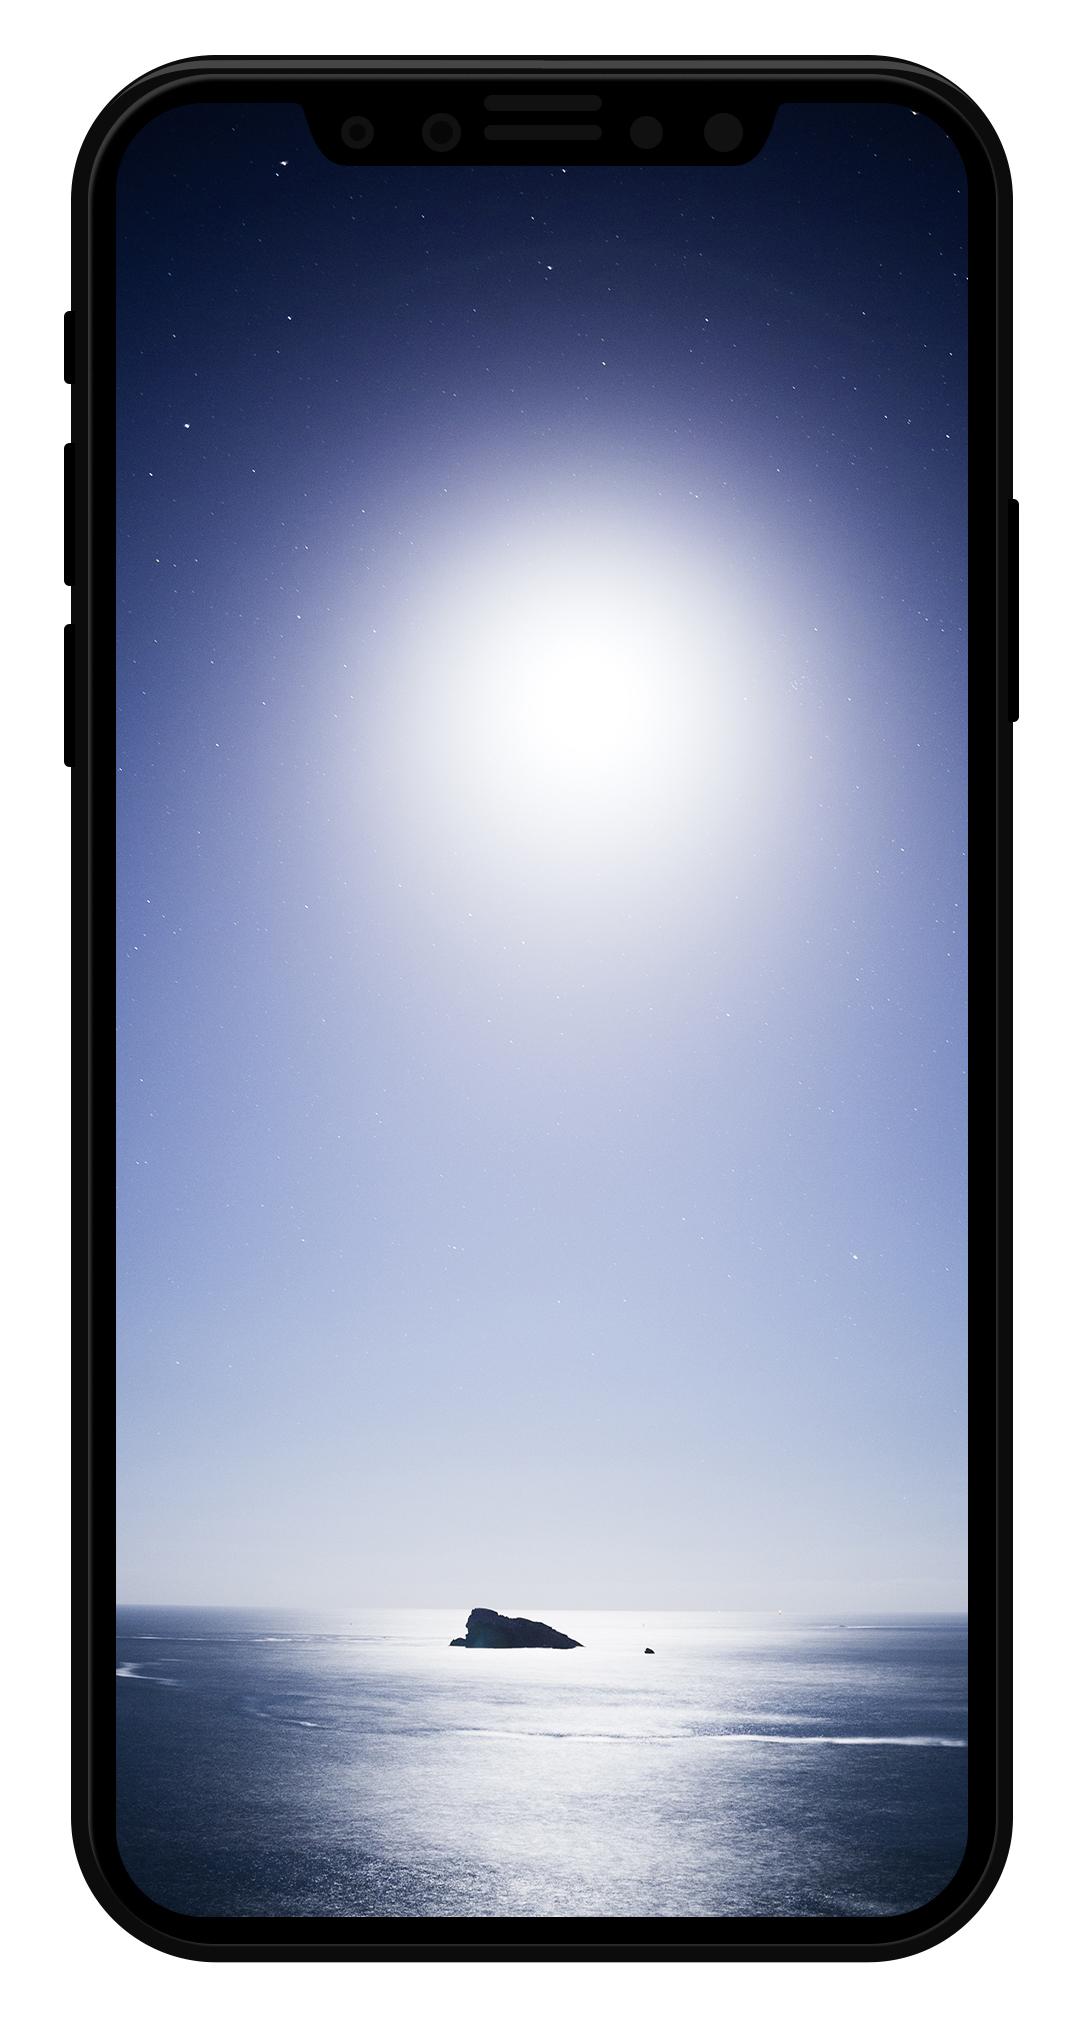 iphone-8-mockup-downloadableU.jpg